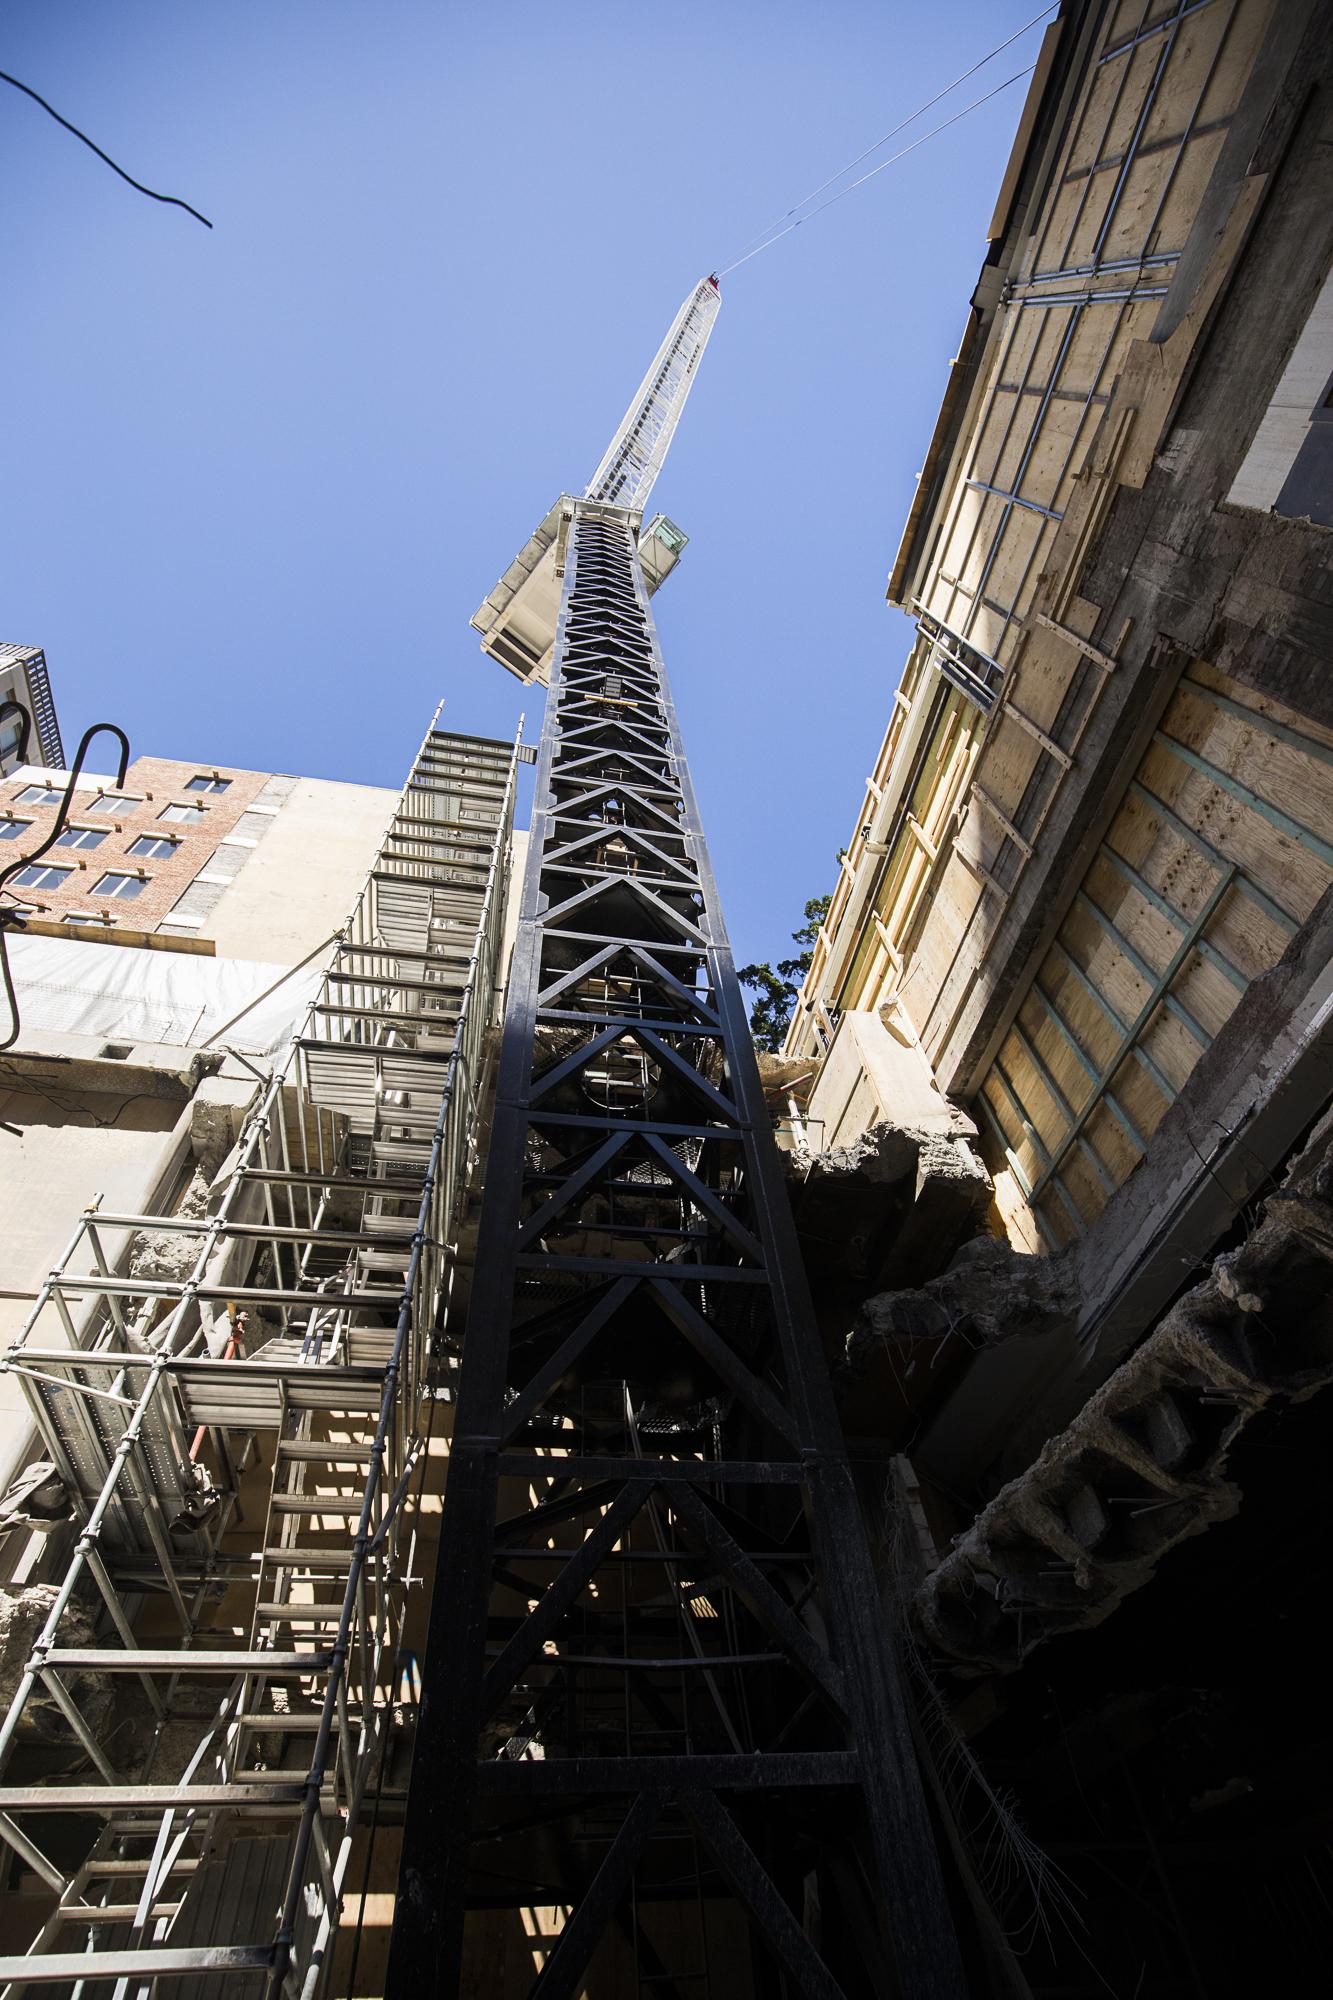 Tower - TC 2 operational